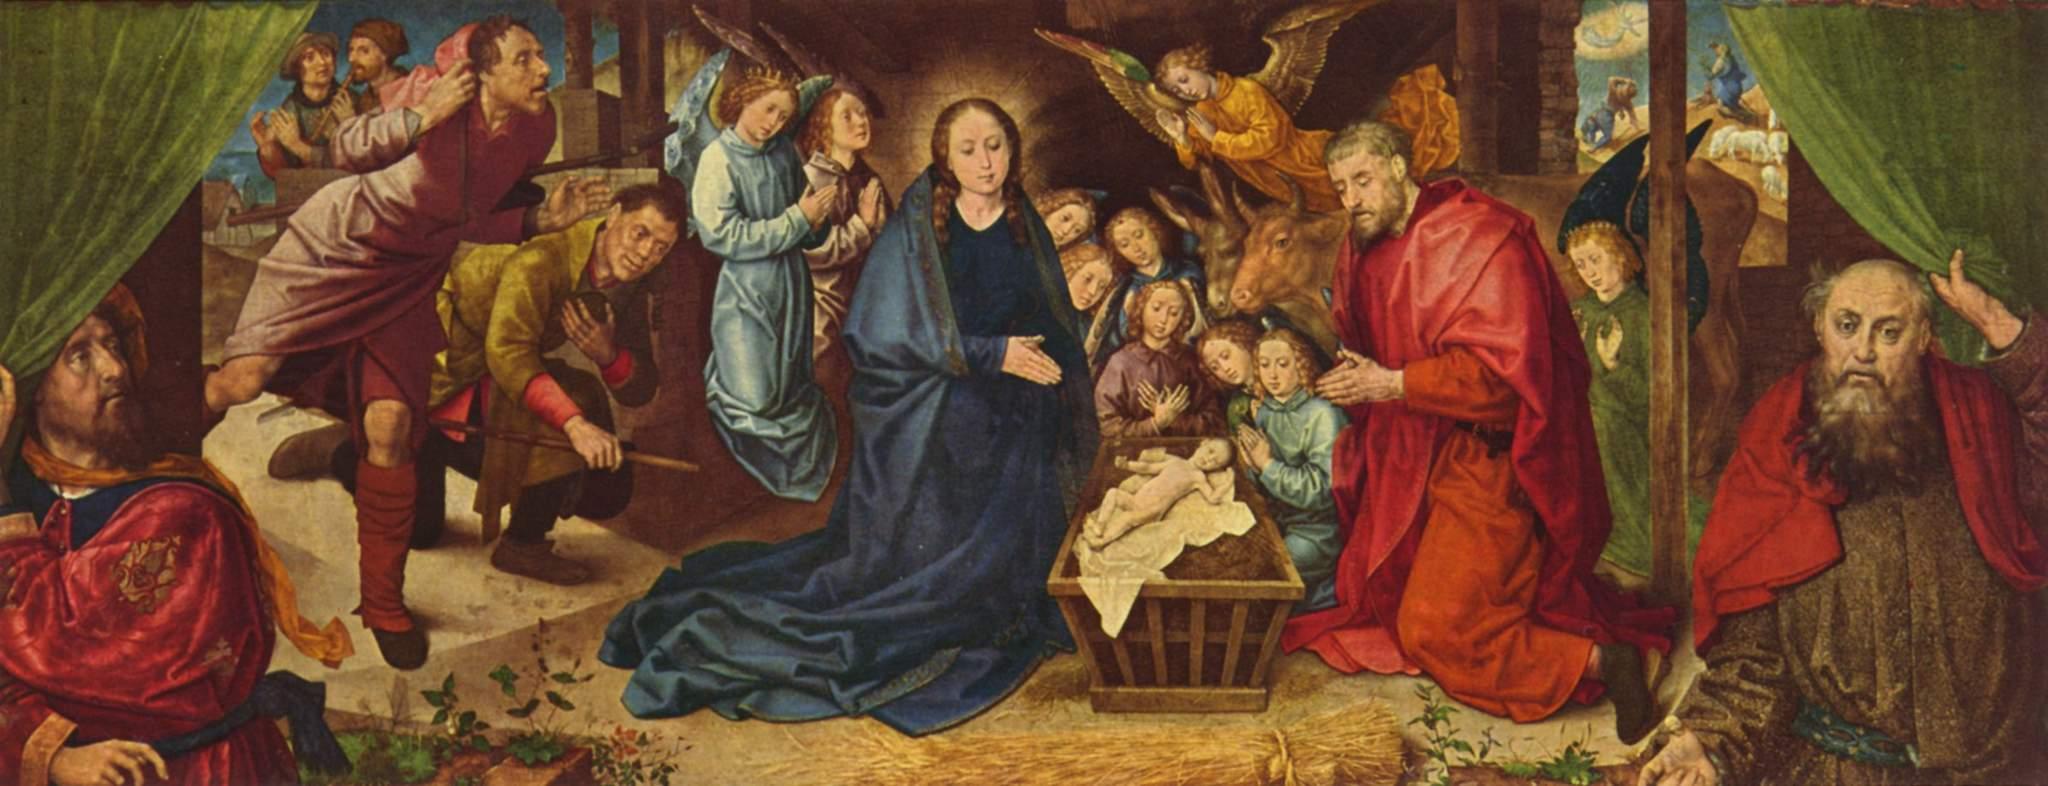 Hugo ven der Goes,  The Veneration of the Shepherds